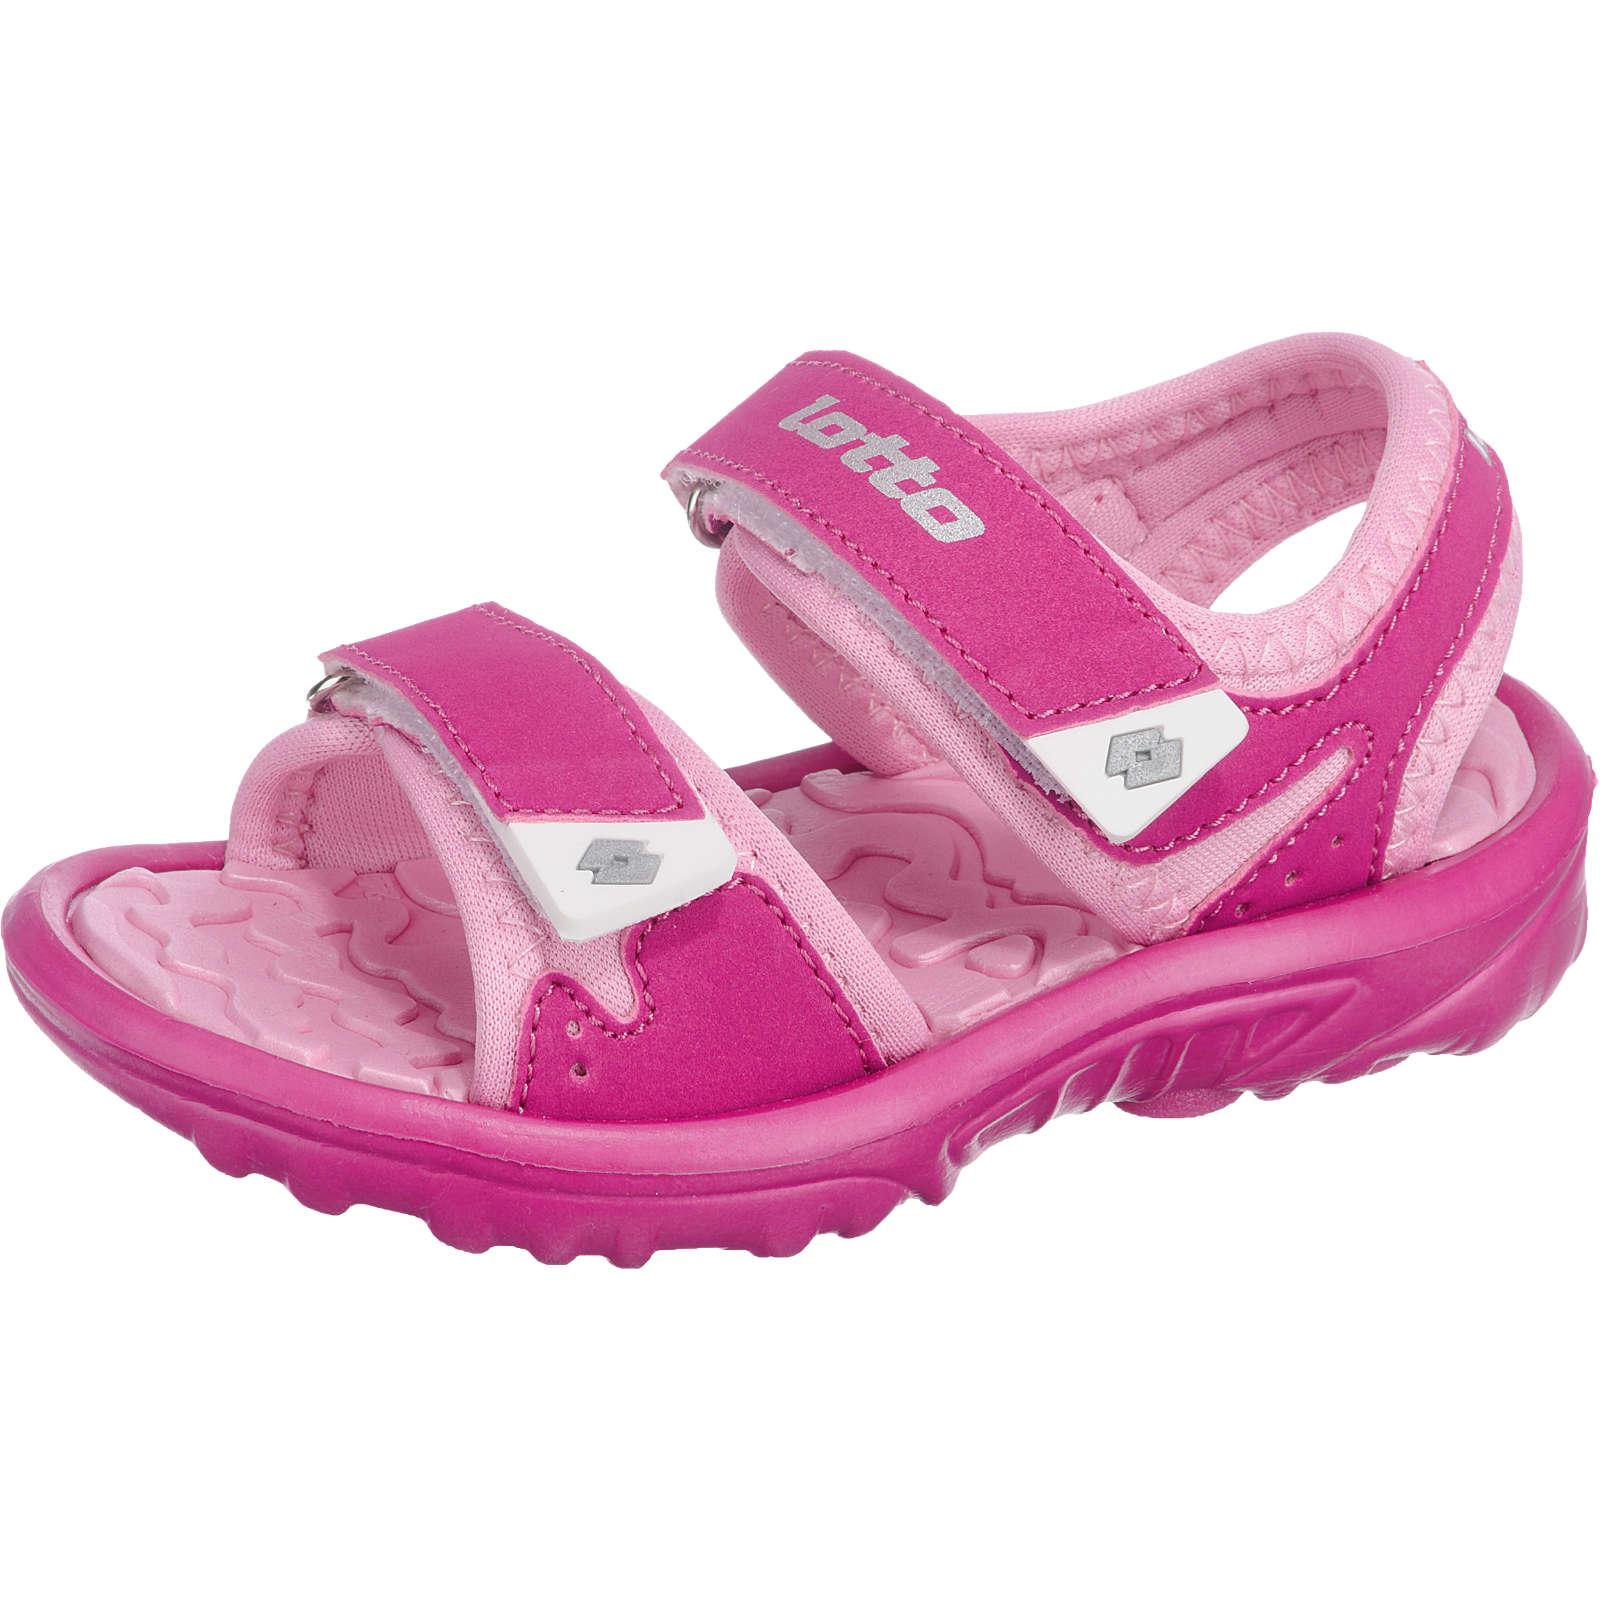 lotto Kinder Sandalen LAS ROCHAS III pink Mädchen Gr. 25